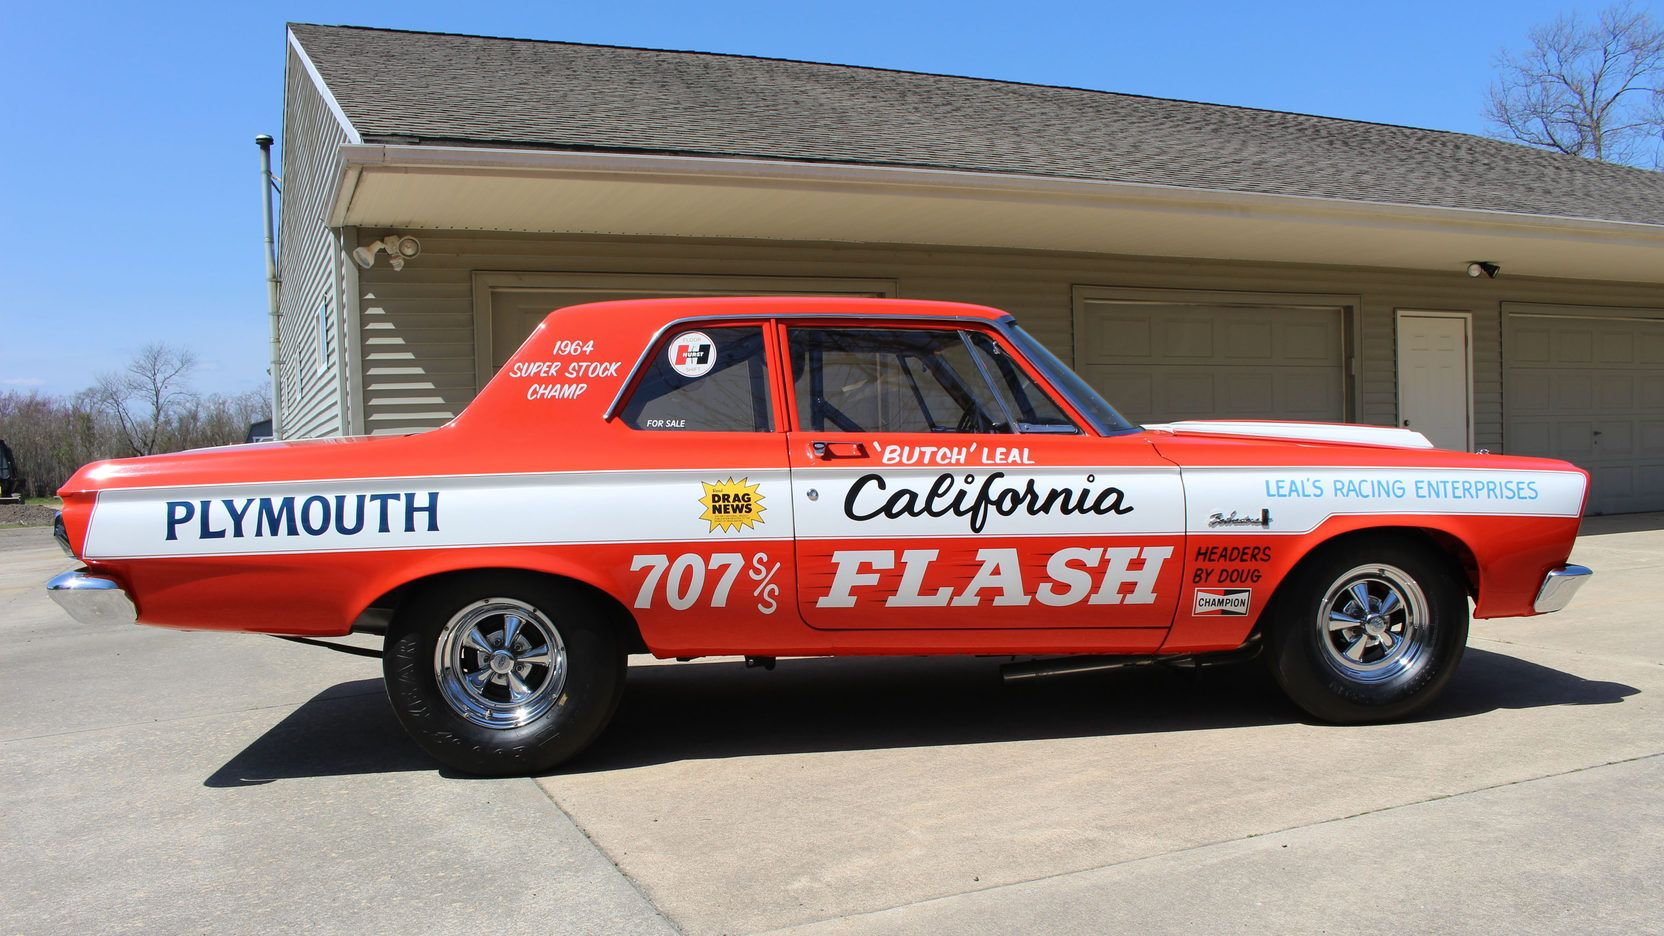 Pin On Butch Leal California Flash Drag Car